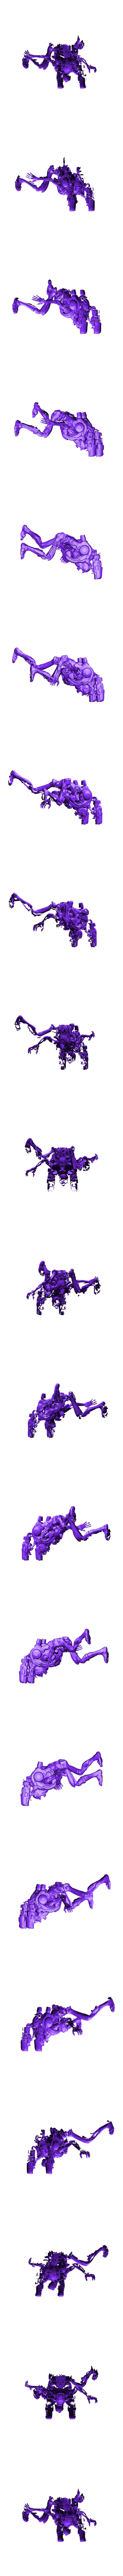 Revenant_posed.stl Download free STL file Revenant posed (Doom) • 3D printable object, Animalgel